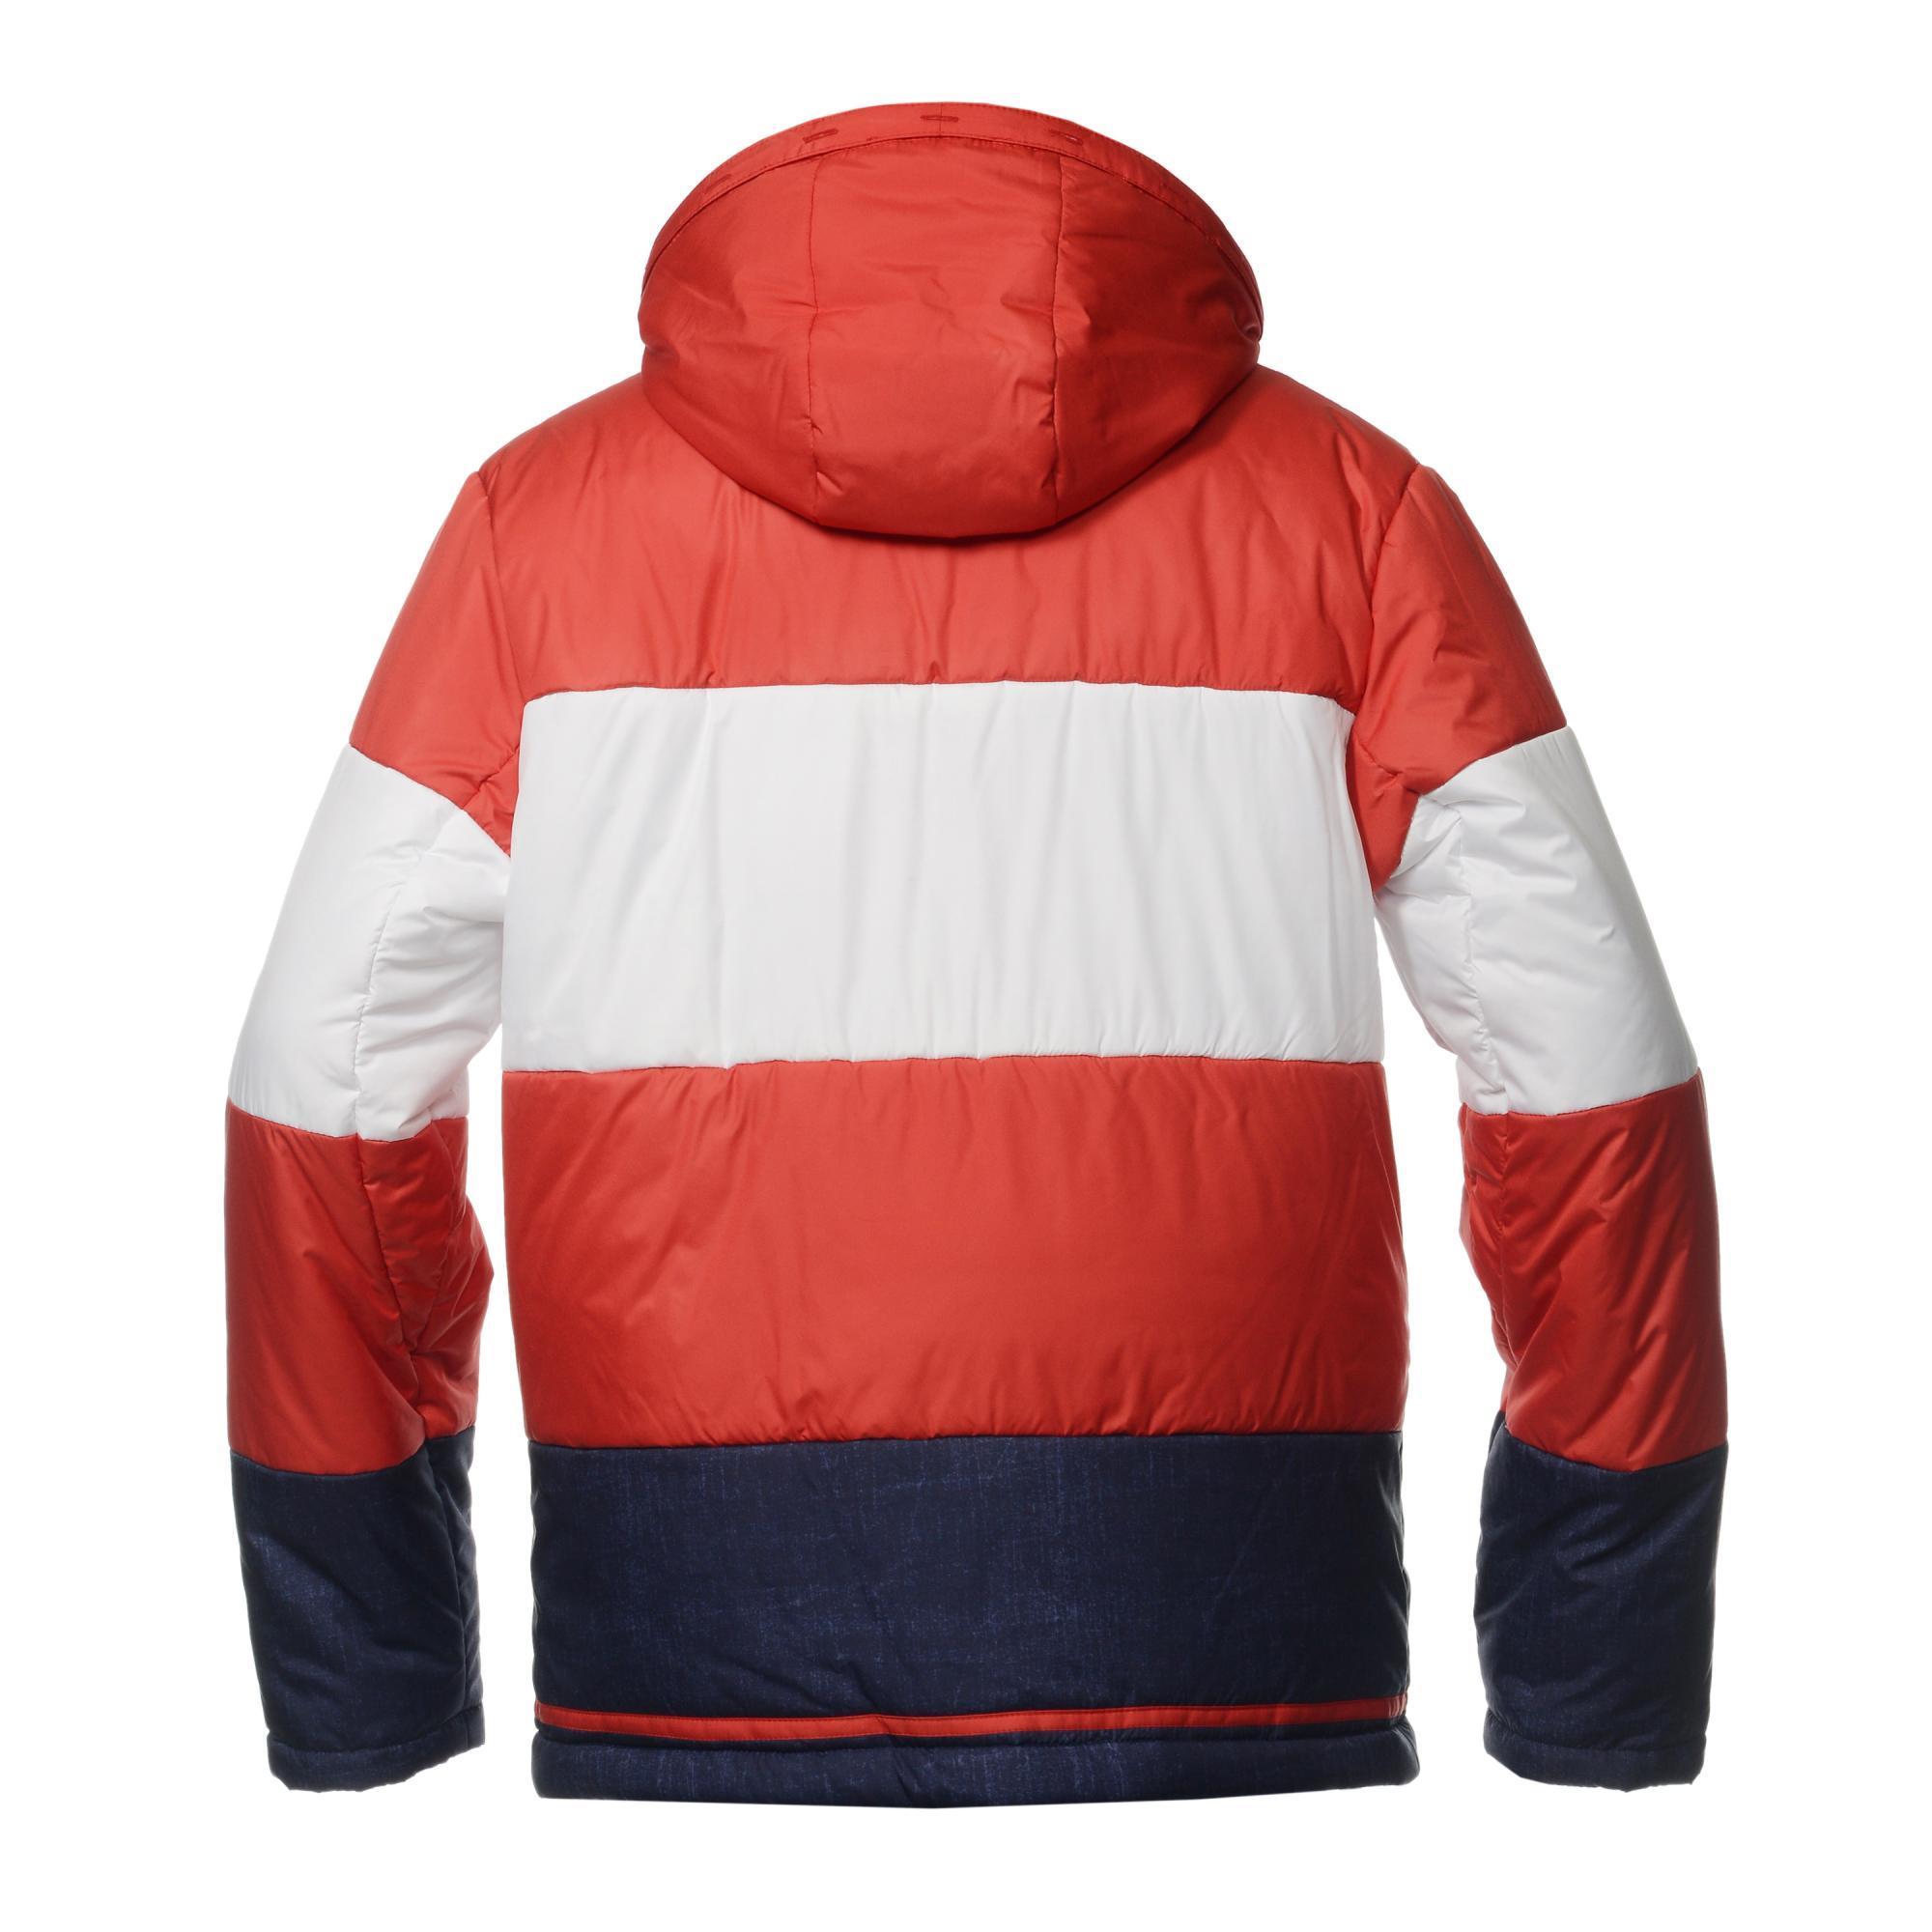 Мужской горнолыжный костюм Almrausch Steinpass-Hochbruck 320109-321300 красный